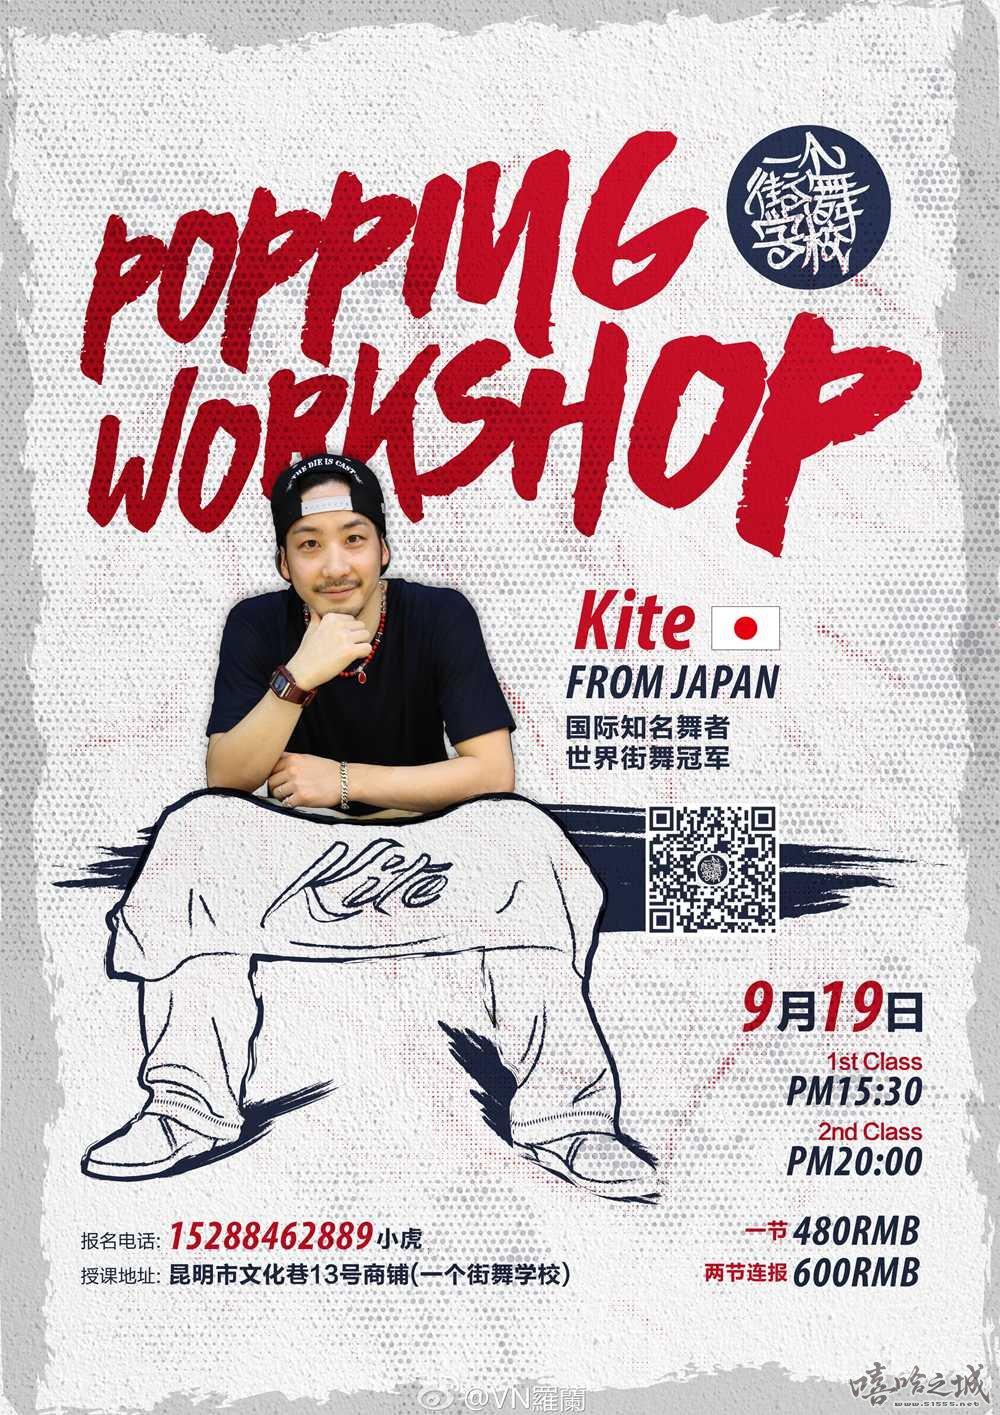 kite popping workshop